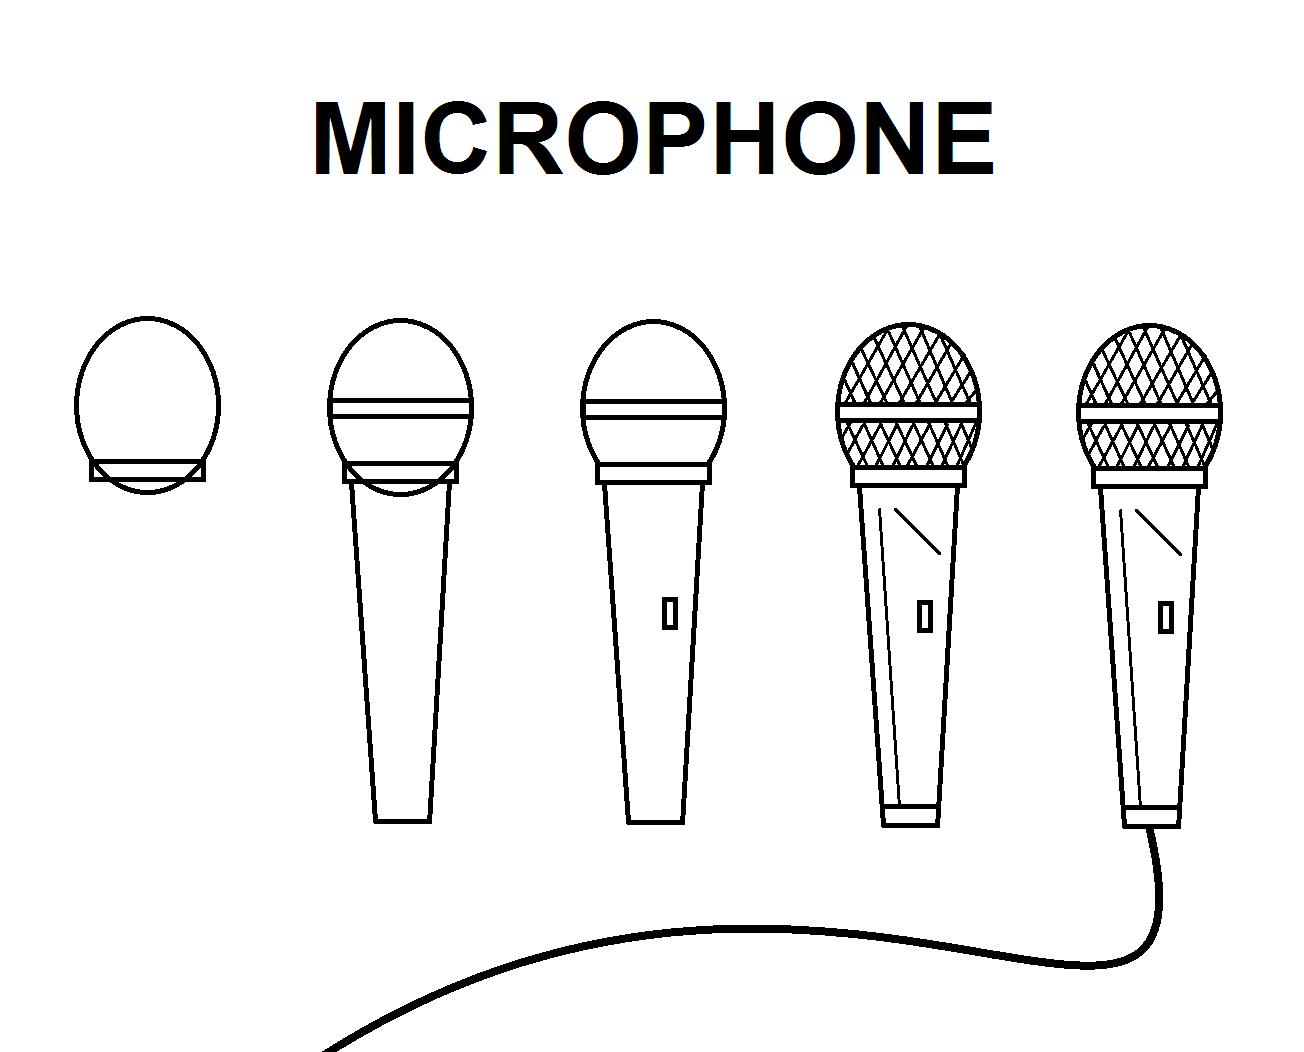 Microphone Microphone Drawing Easy Drawings Microphone